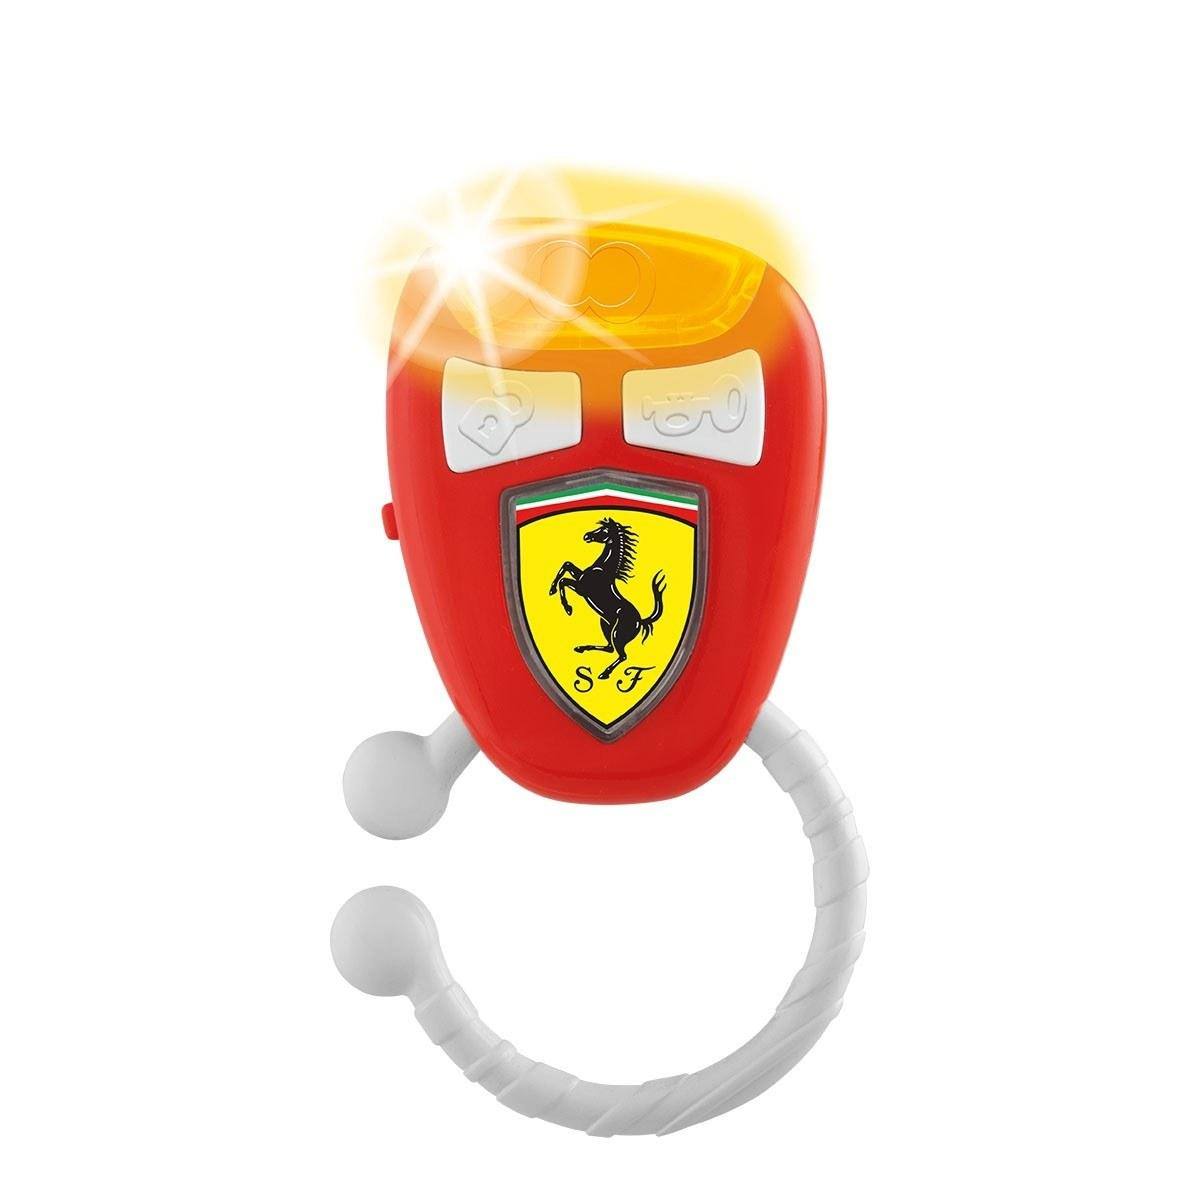 "Игрушка музыкальная Chicco ""Ключи Ferrari"", 3 мес+"